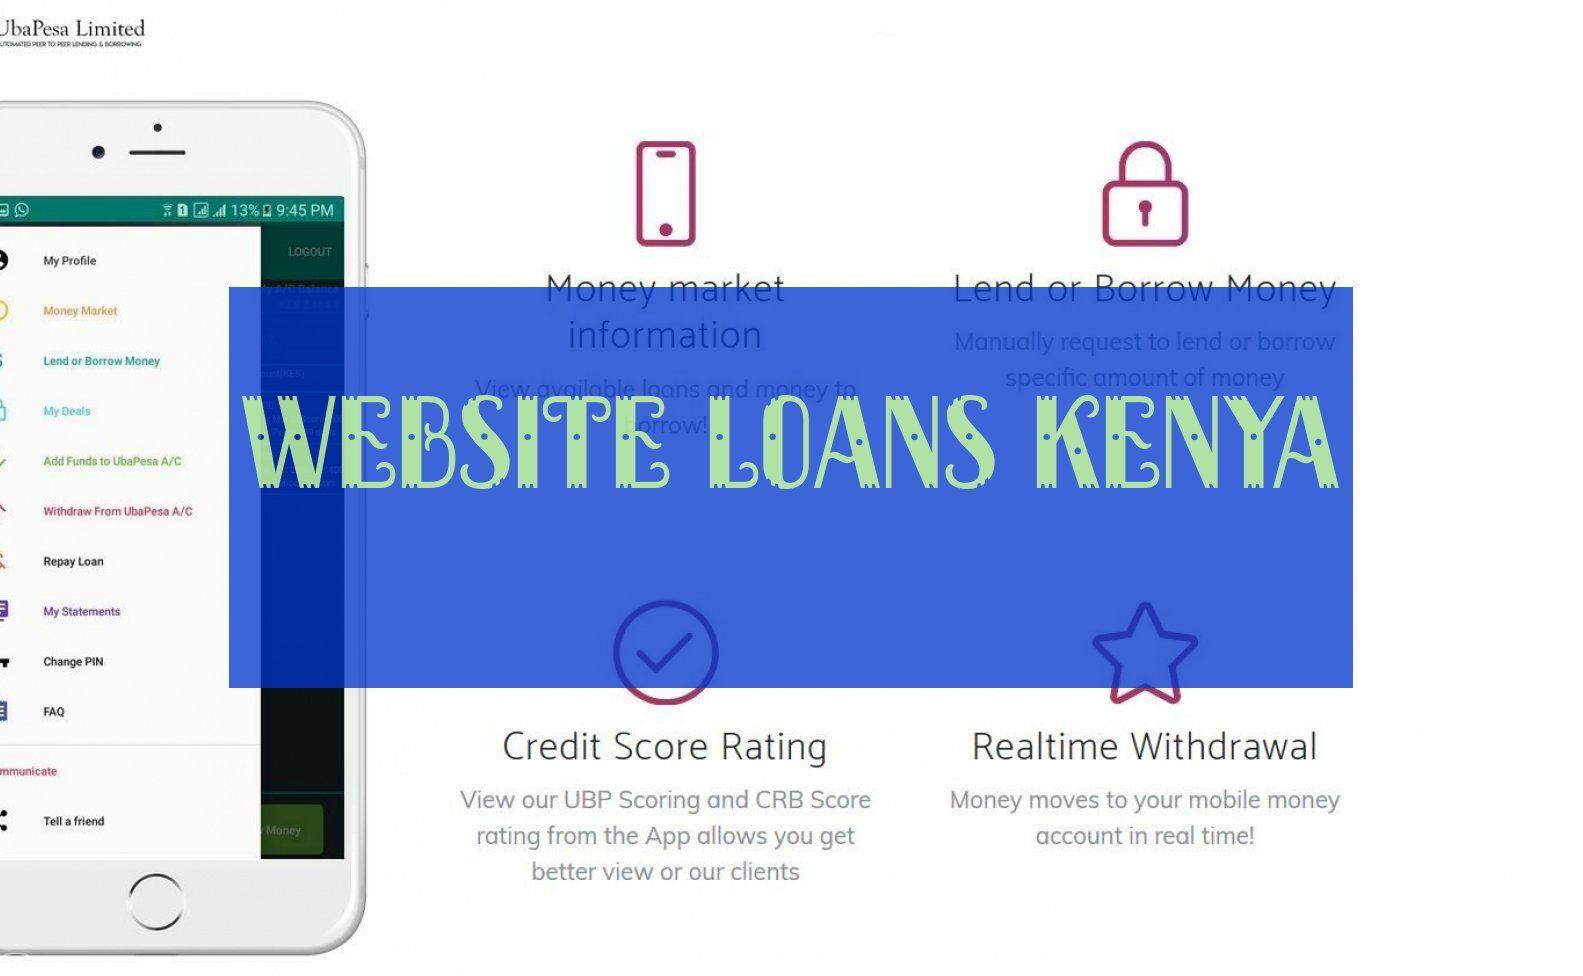 Website Darlehen Kenia Borrow Money Credit Score Rating Credit